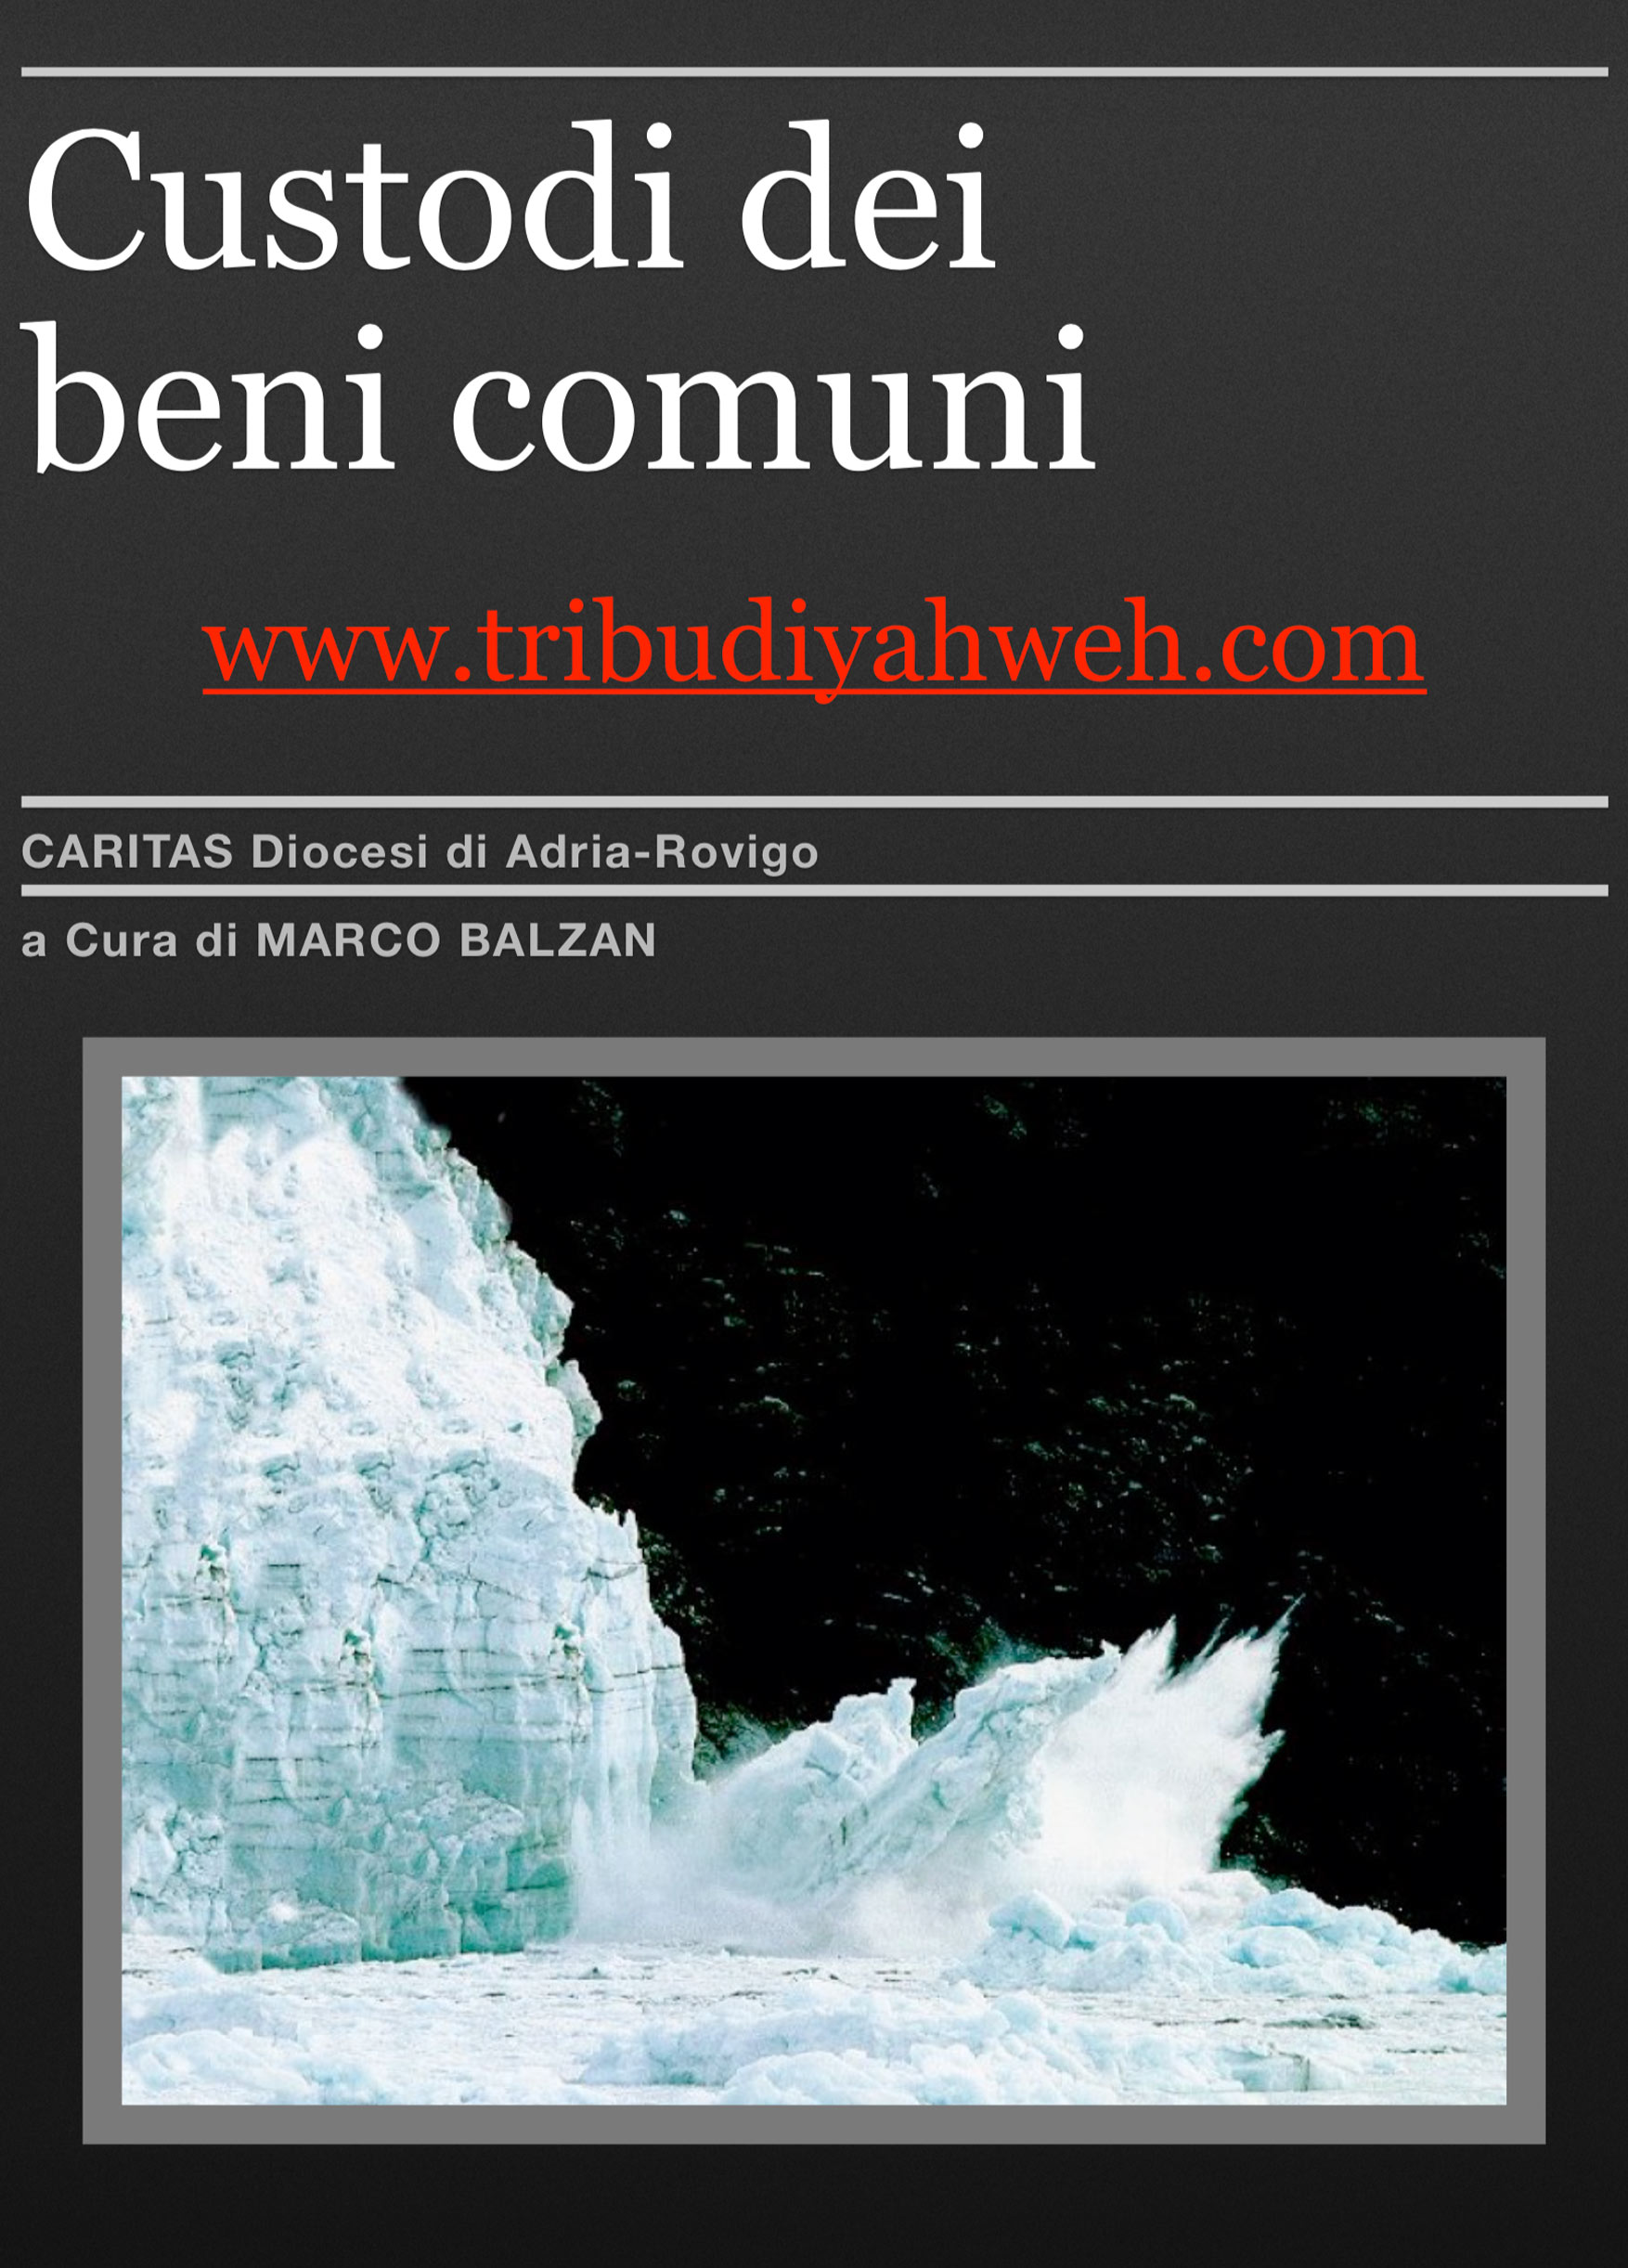 http://www.tribudiyahweh.com/wp/wp-content/uploads/2019/04/custodi_beni_comuni.jpg